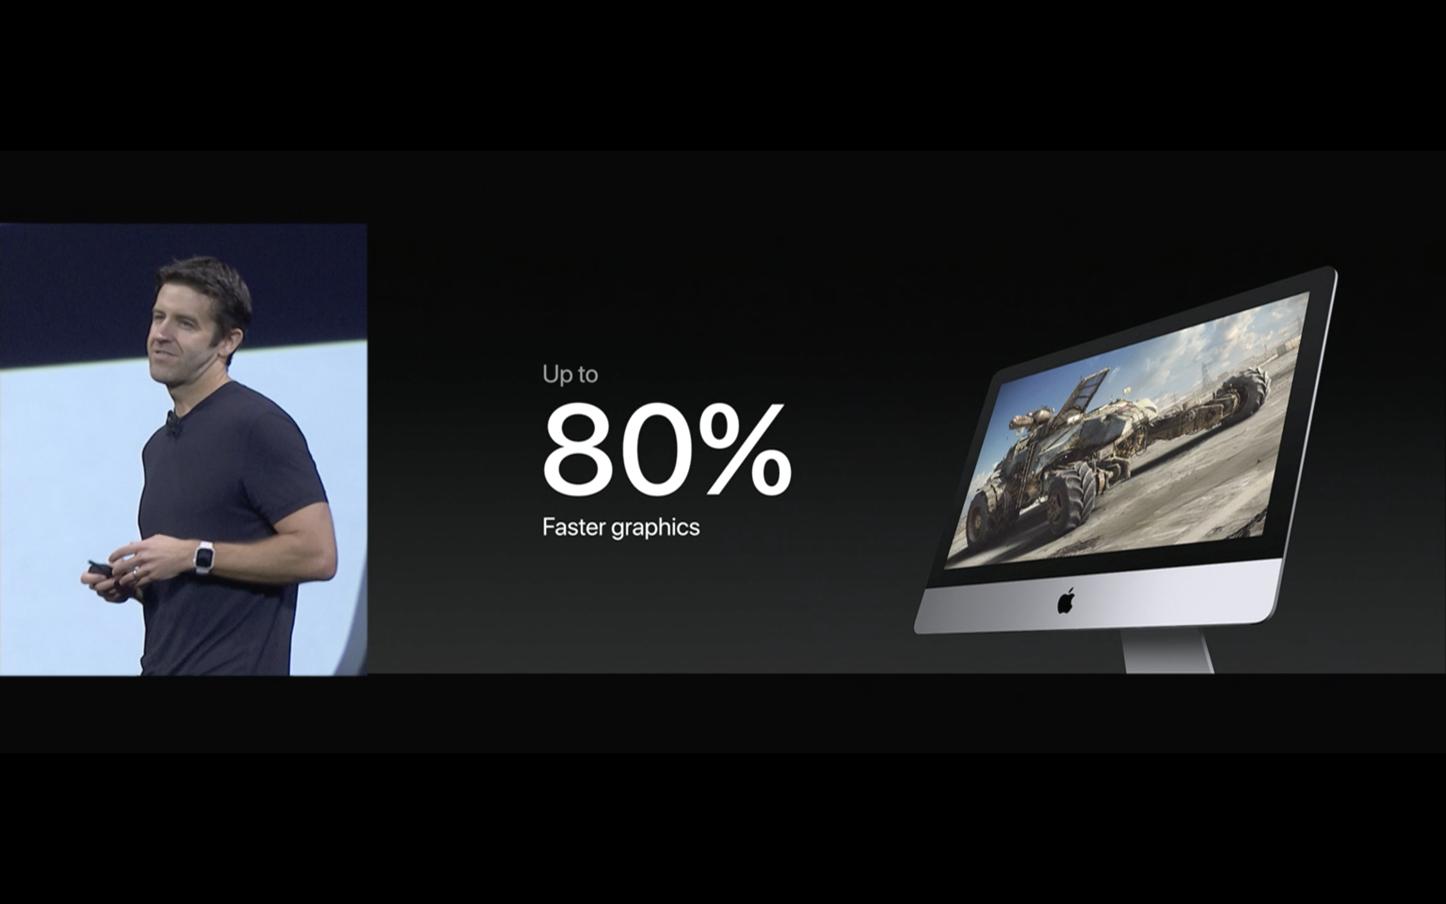 New-iMac-2017-WWDC17-13.png